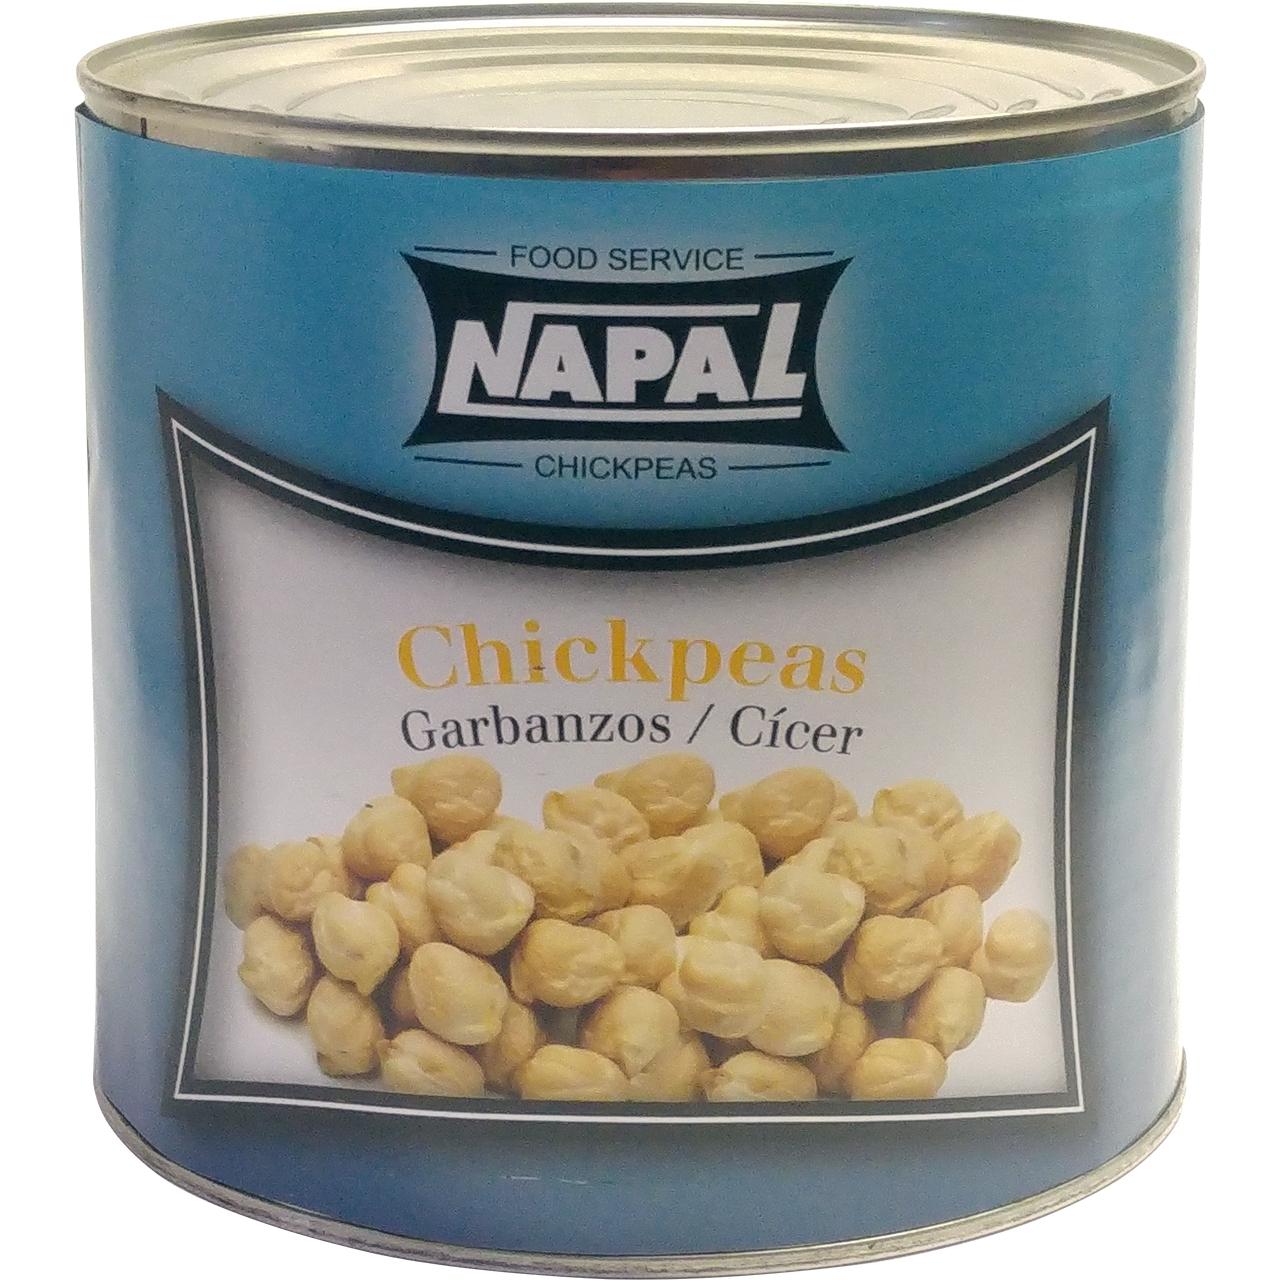 Cigró cuit extra 3kg. Napal